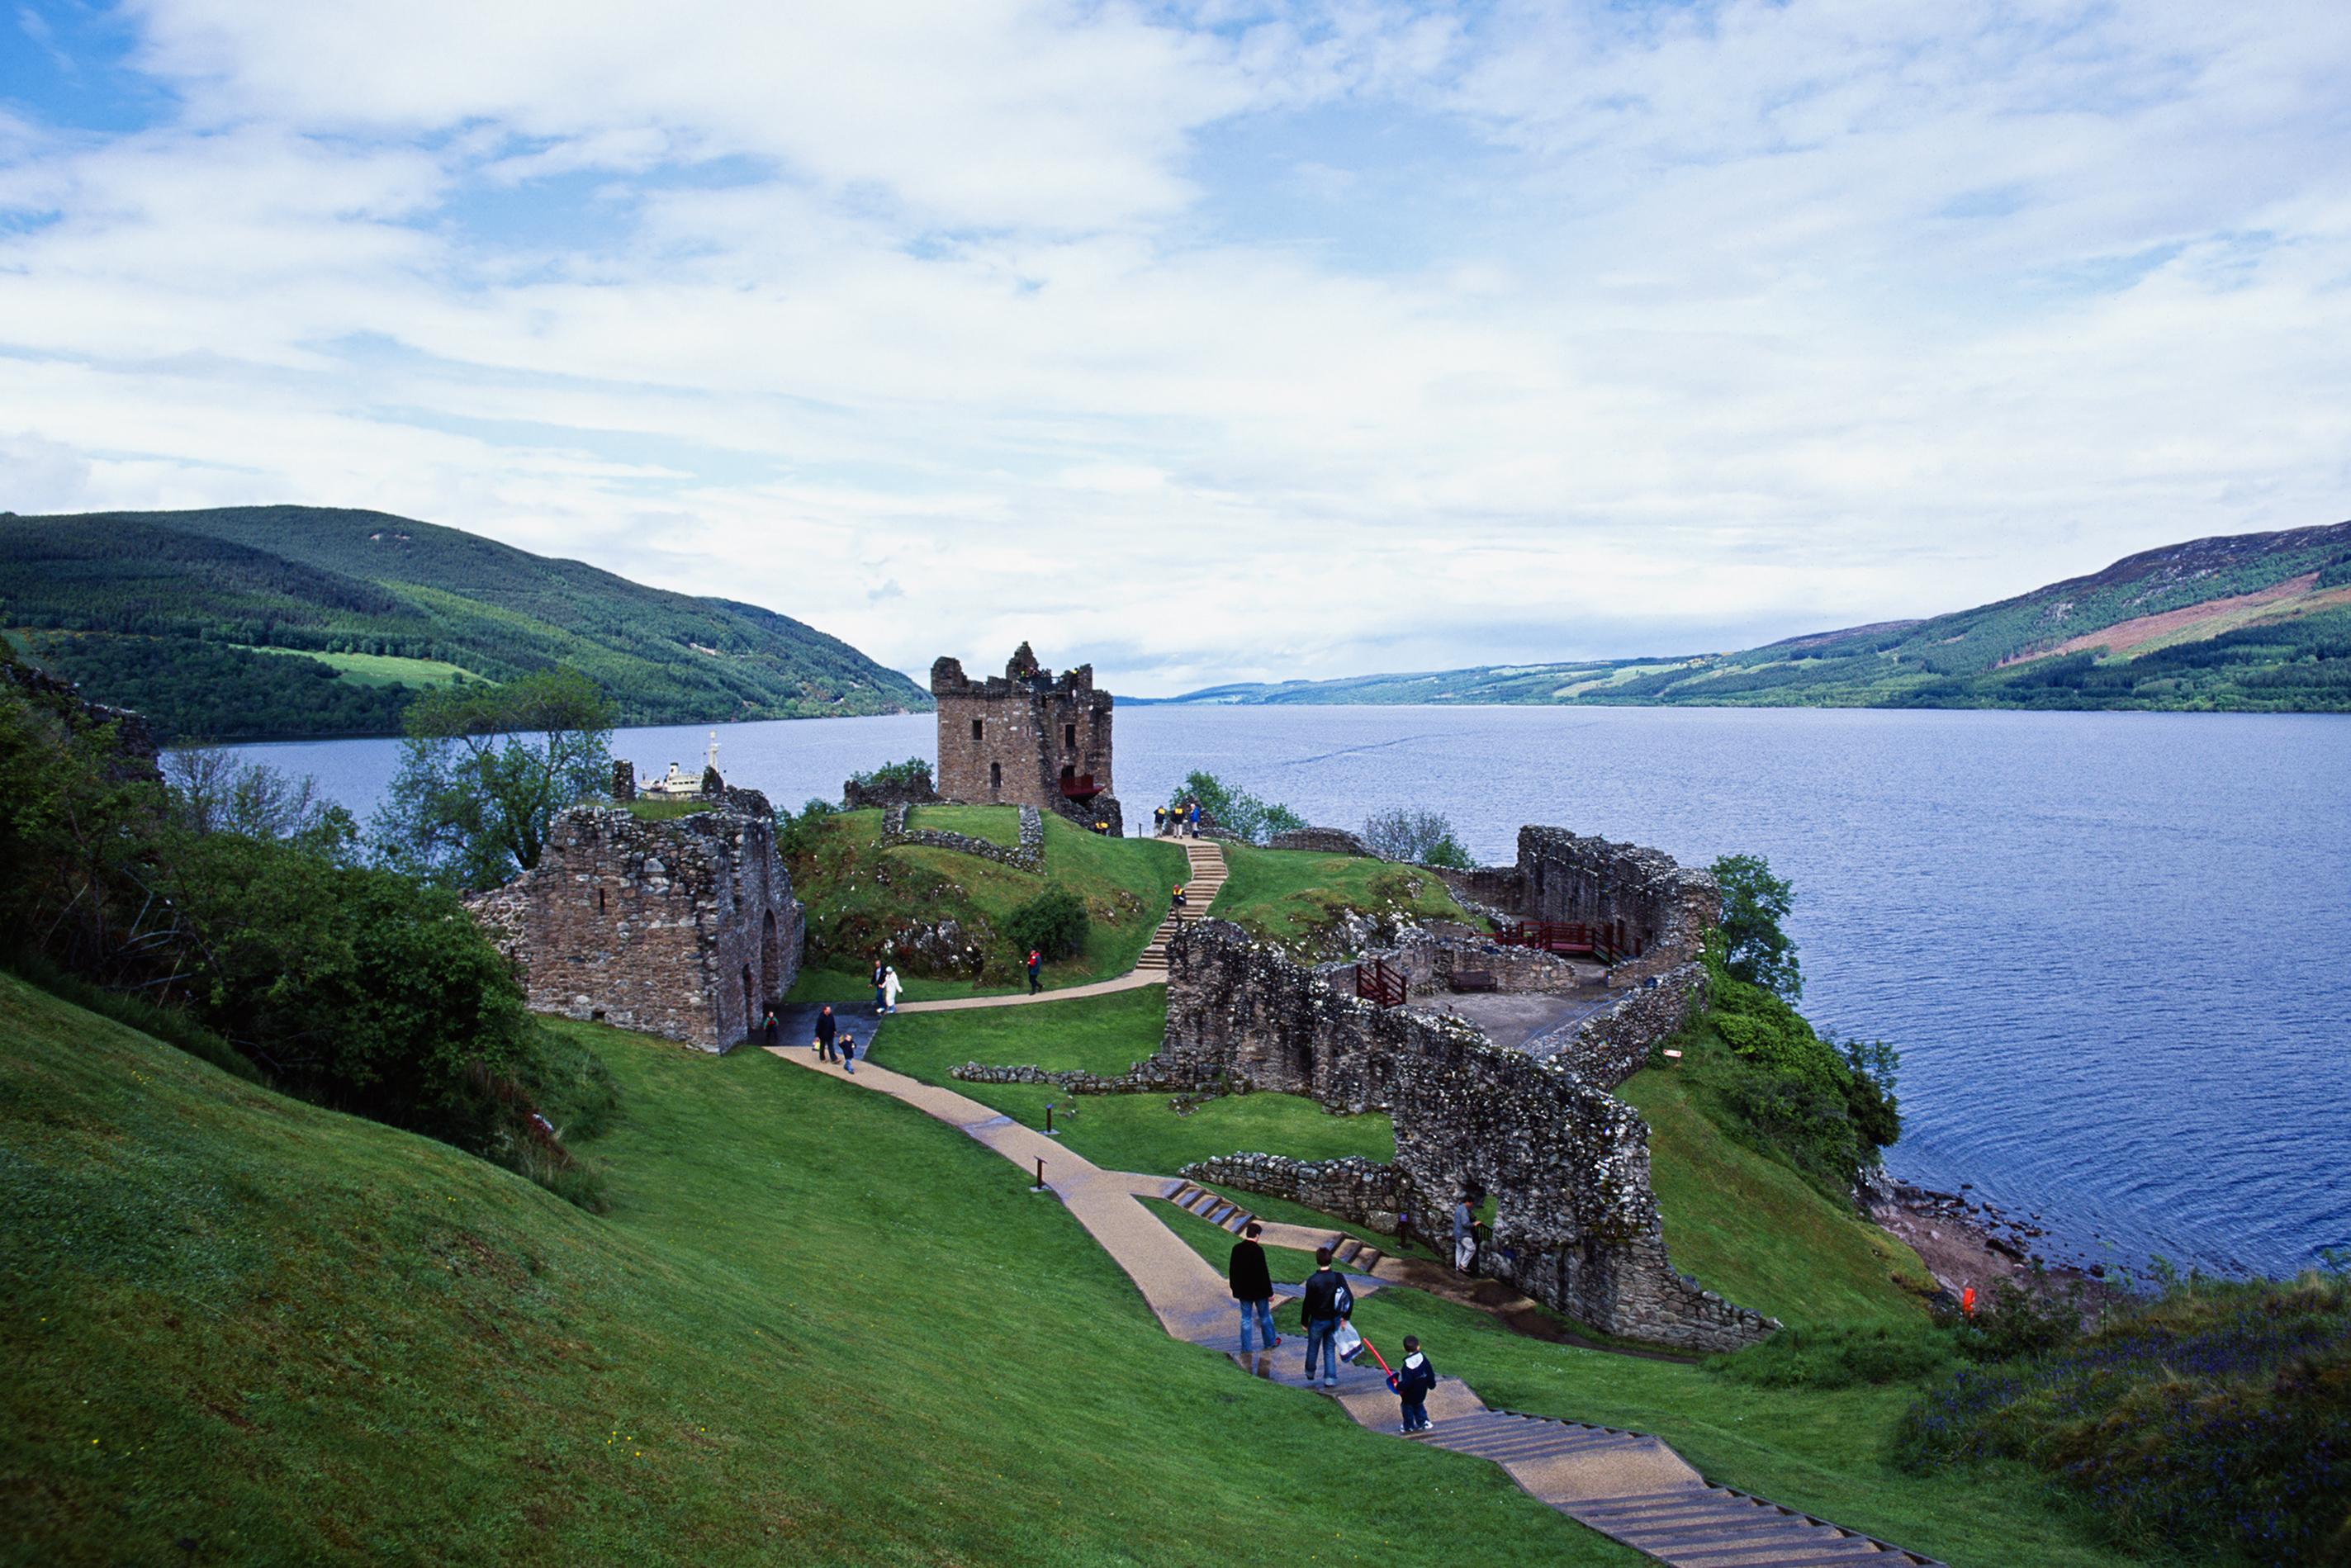 Urquhart Castle at Loch Ness Scotland